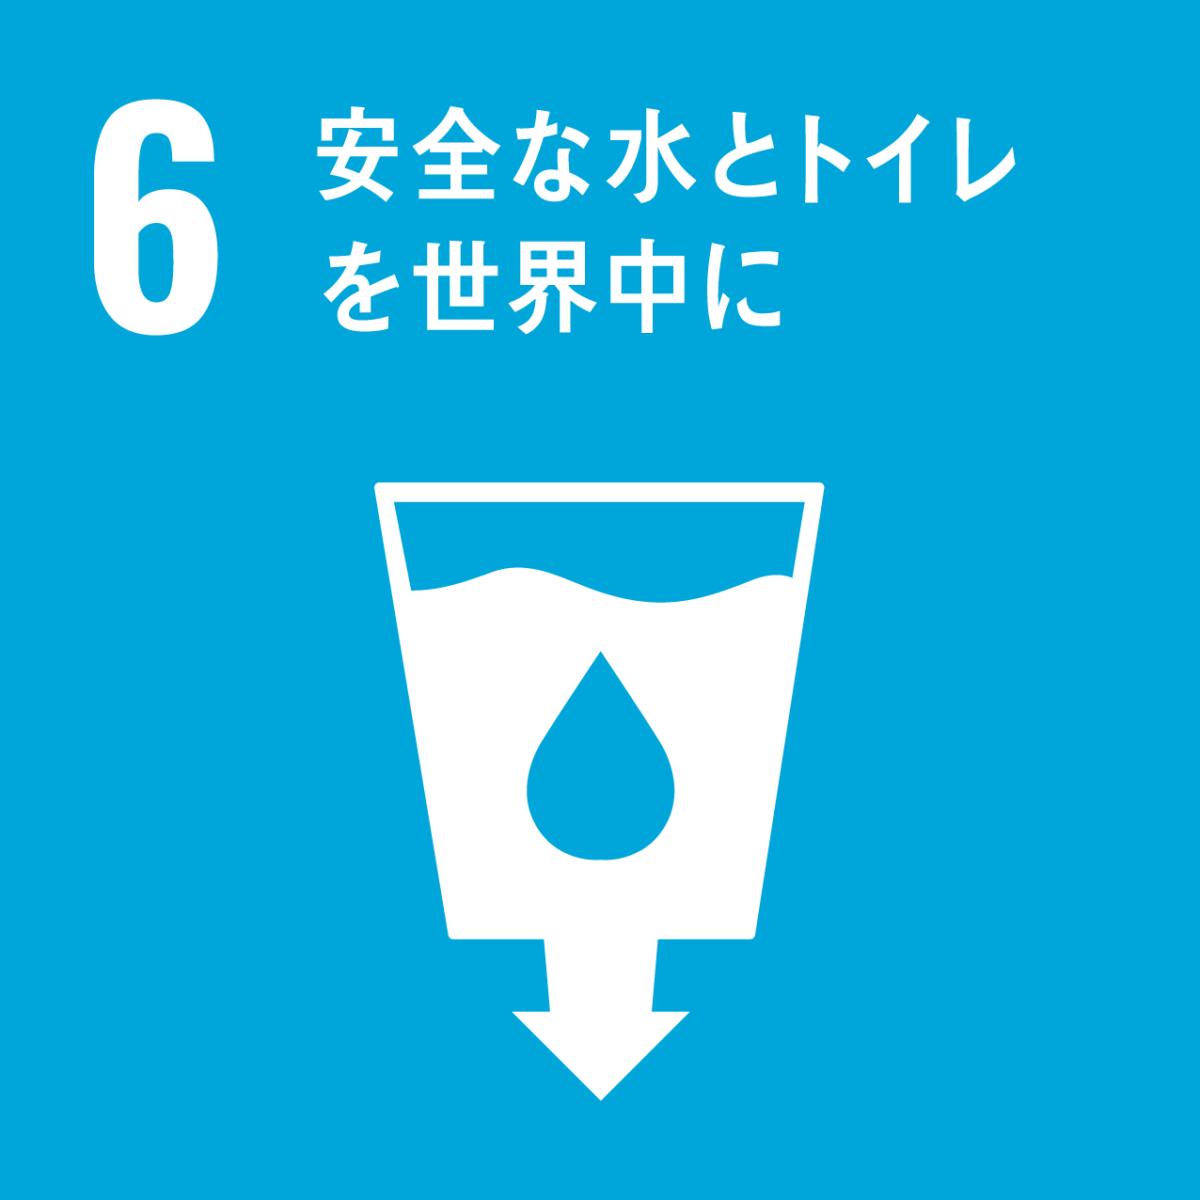 SDGs 安全な水とトイレを世界中に